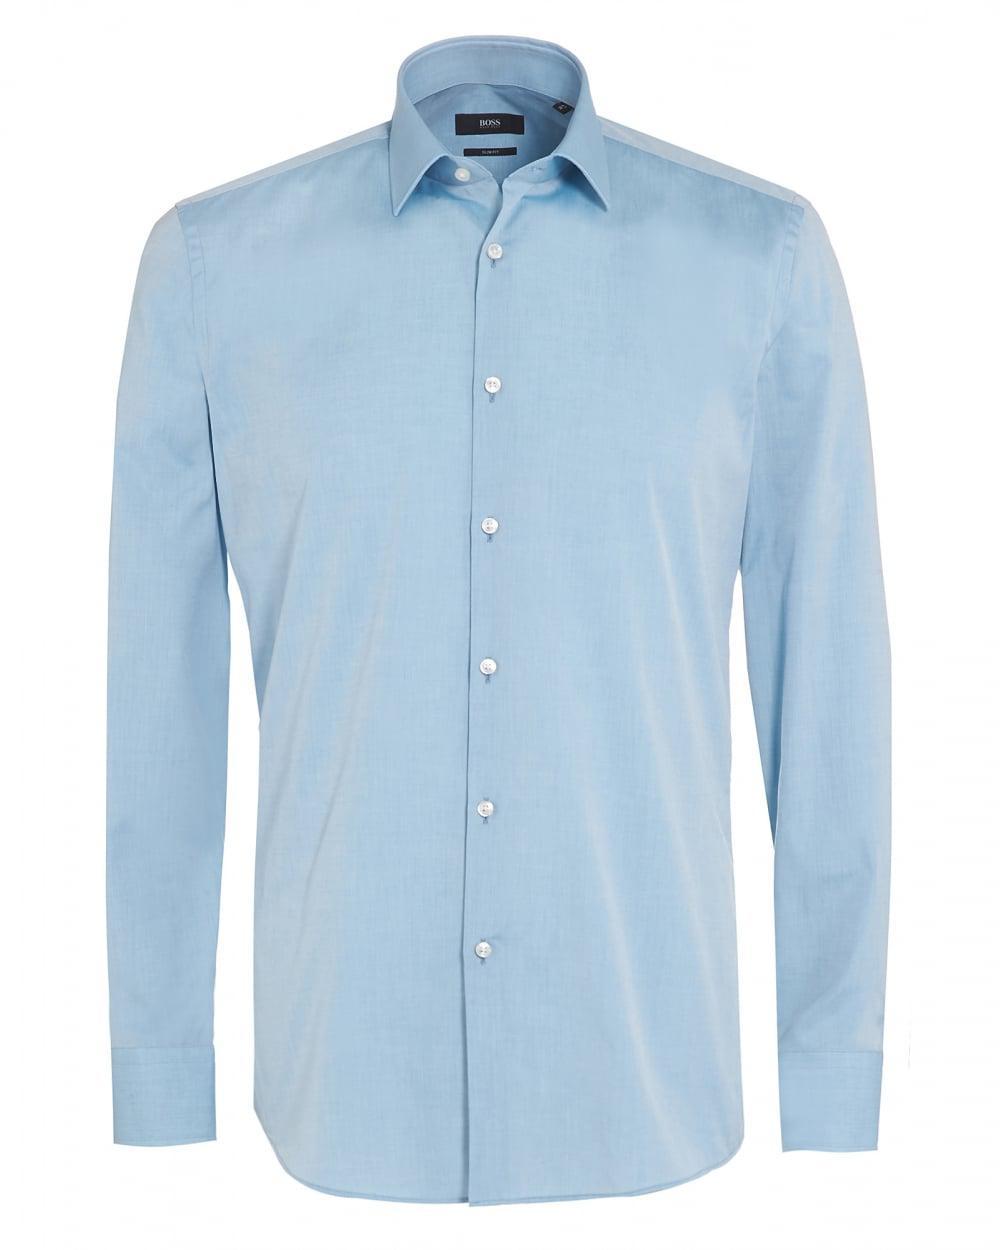 a54e9c5f BOSS Jenno Shirt, Aqua Blue Slim Fit Shirt in Blue for Men - Lyst